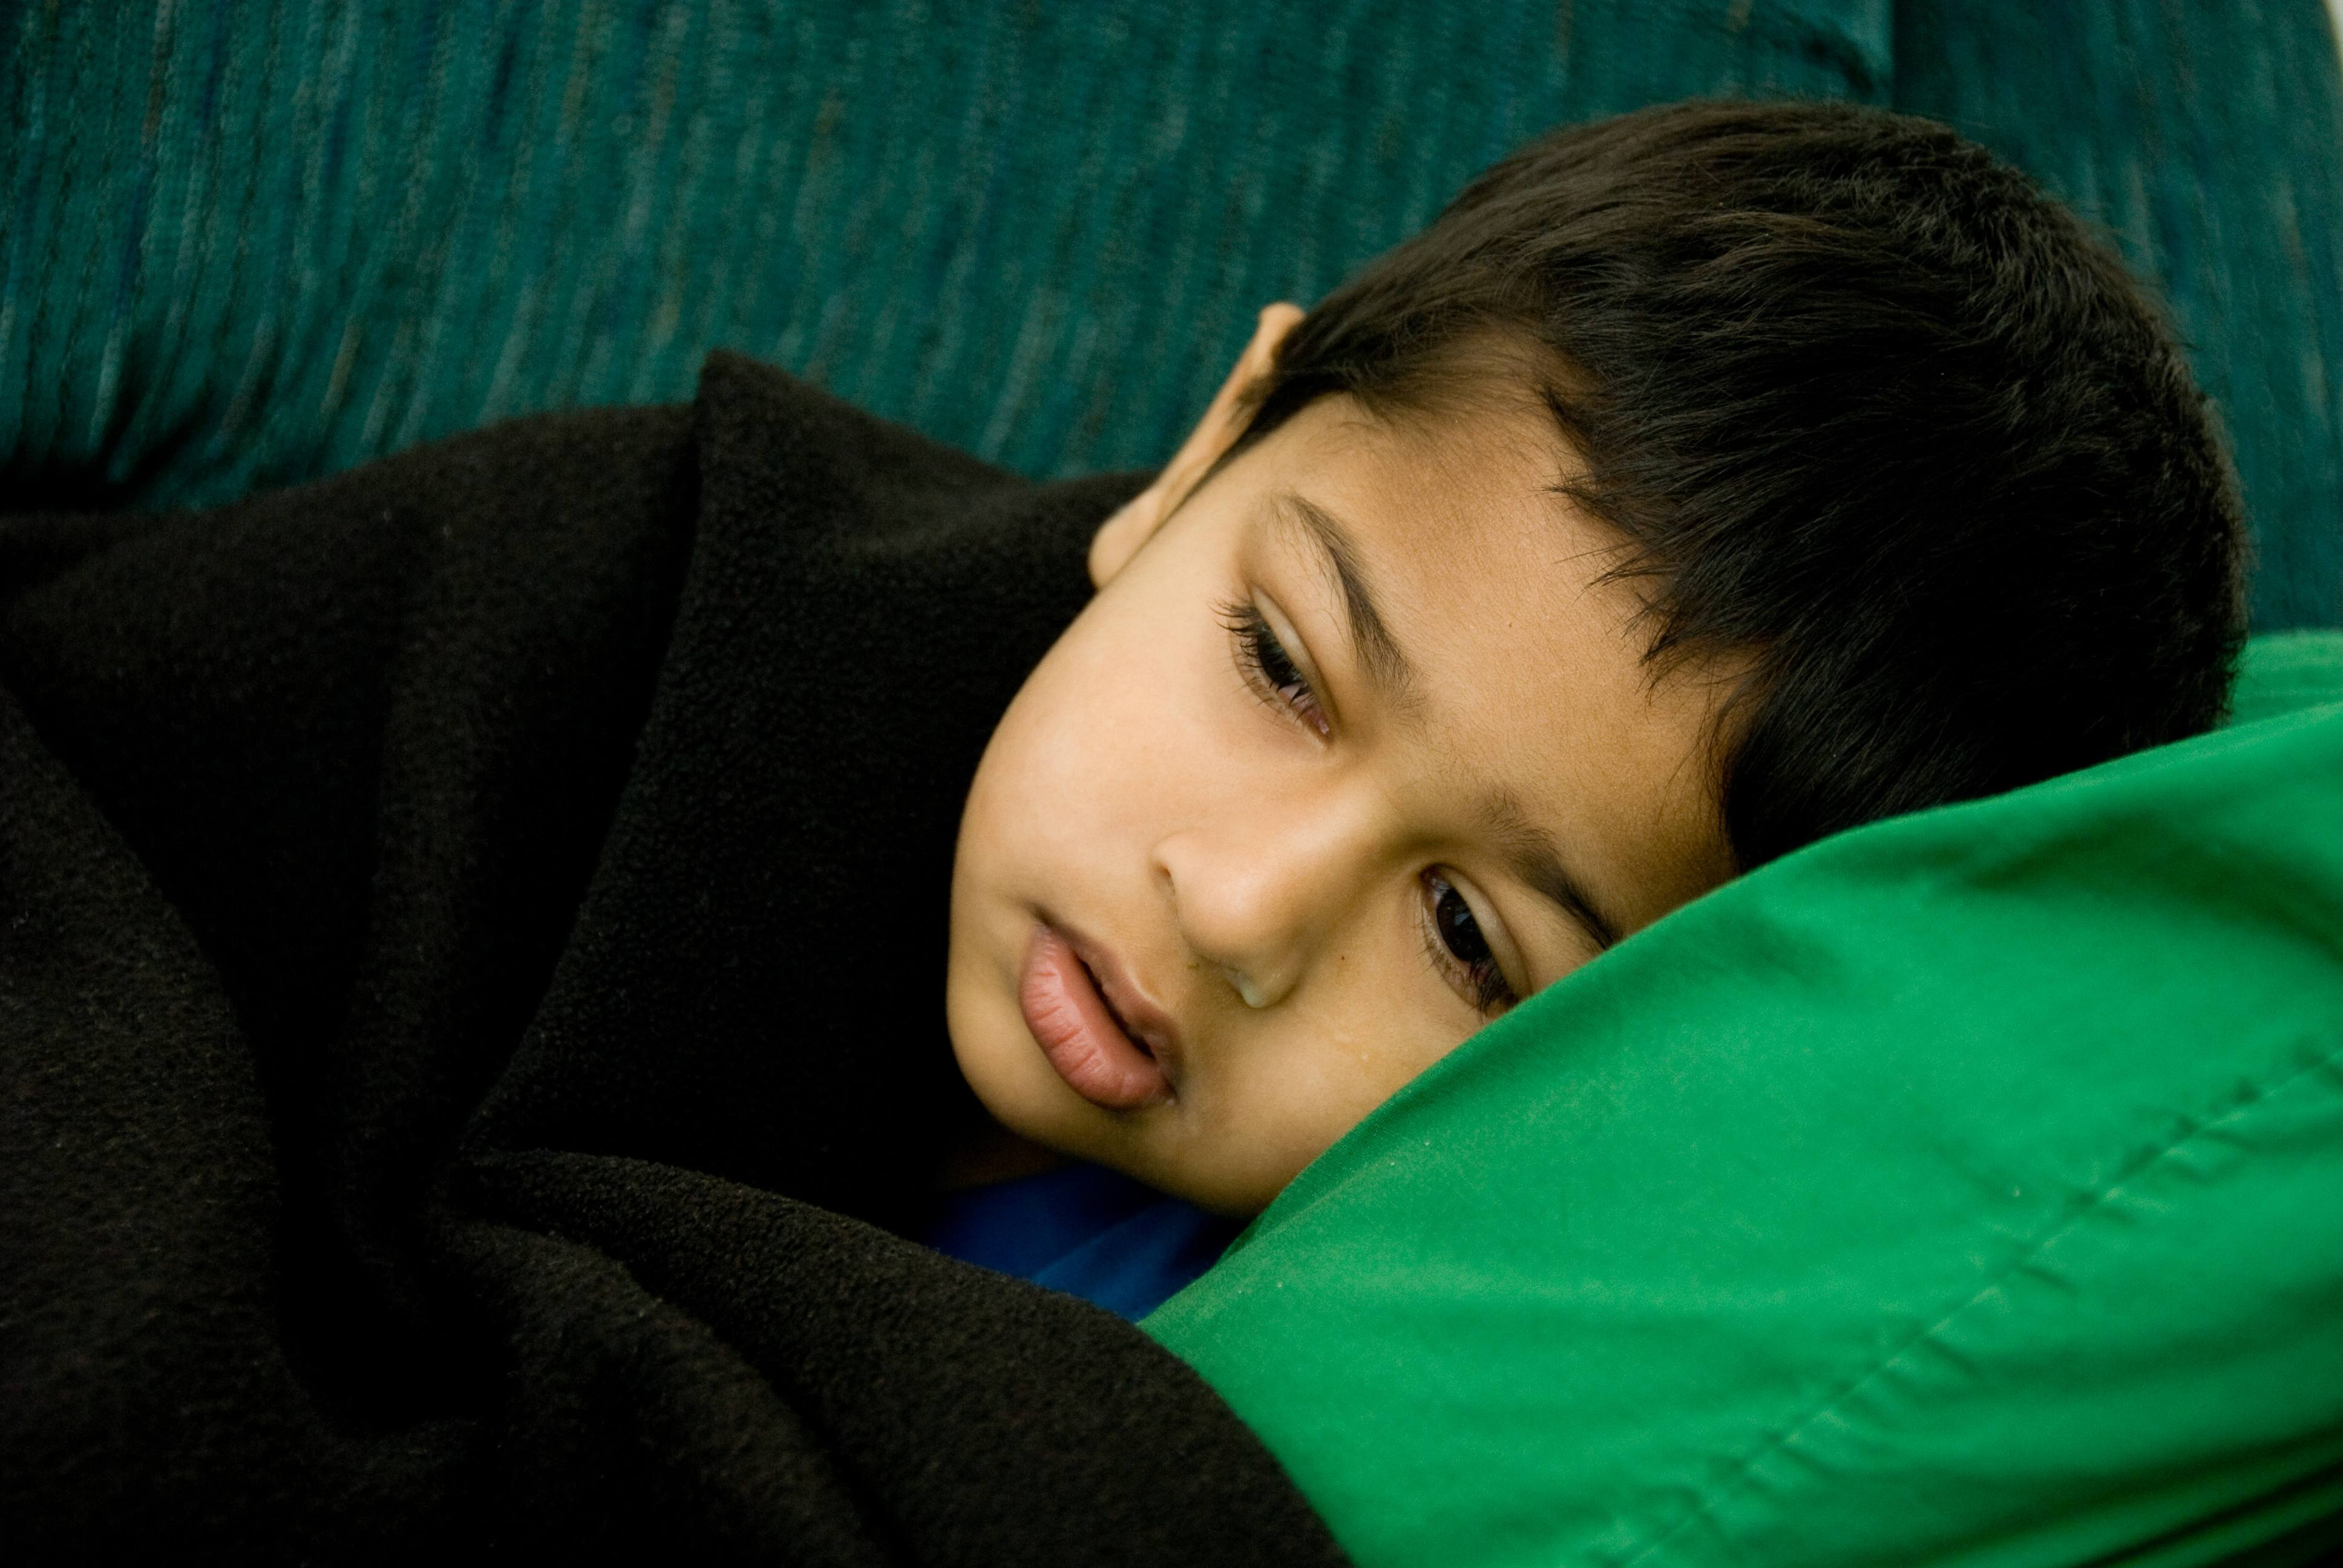 A handsome sick boy resting